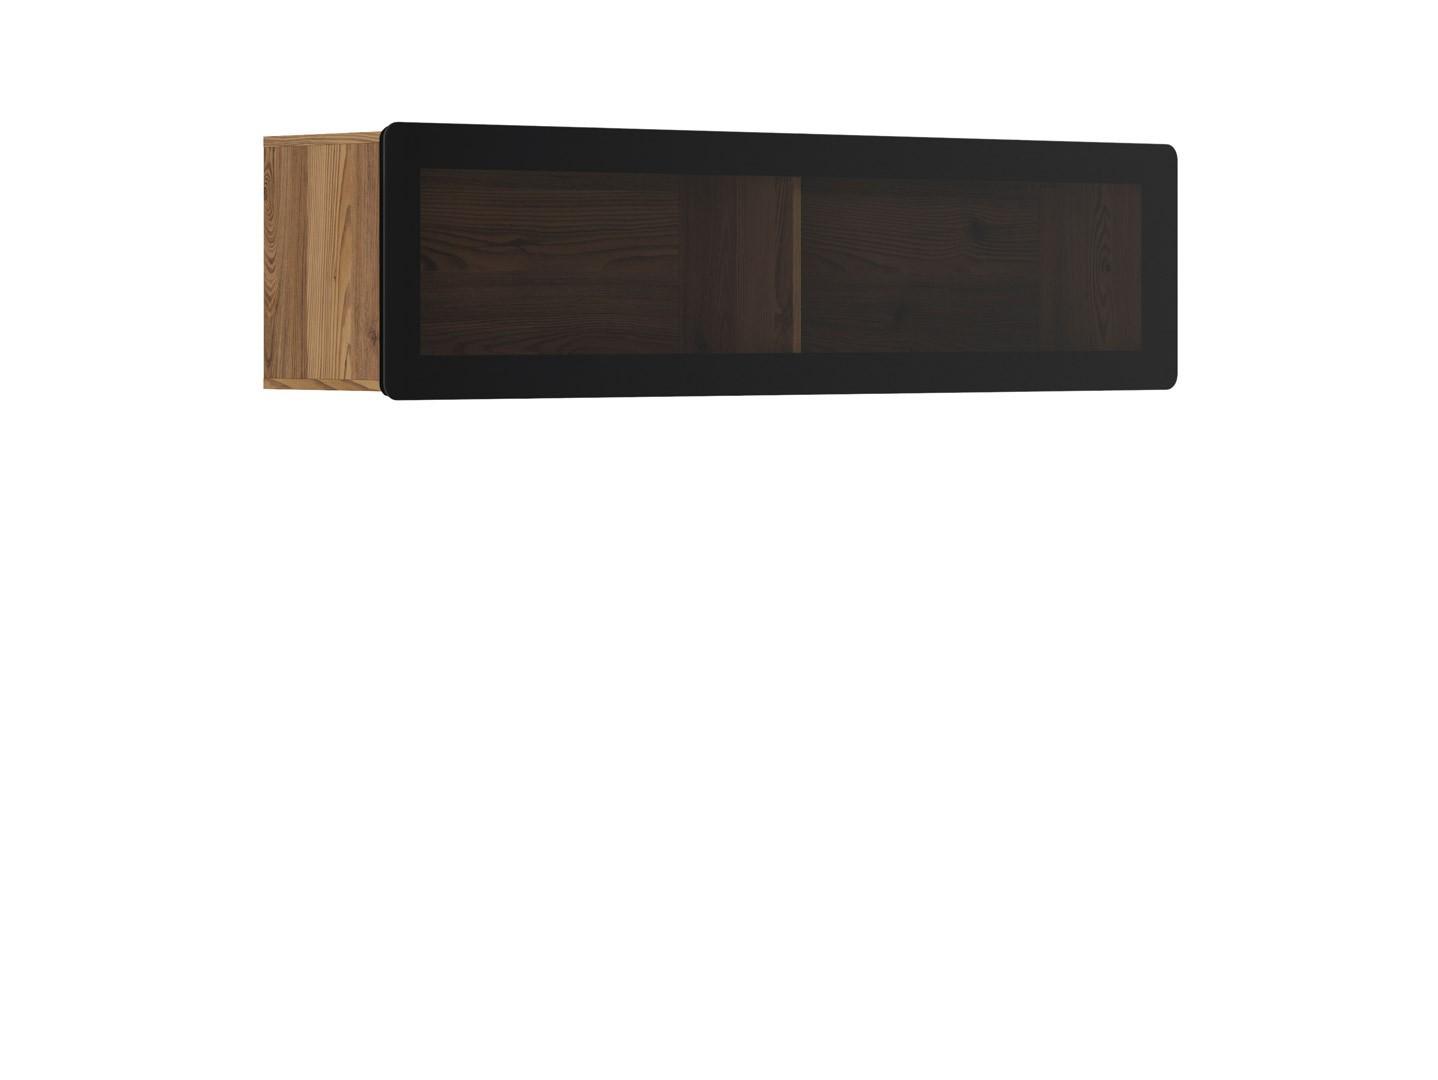 Vitrína na zeď - BRW - Possi Light - SFW1WK/4/16 (modřín sibiu zlatý) (s osvětlením)